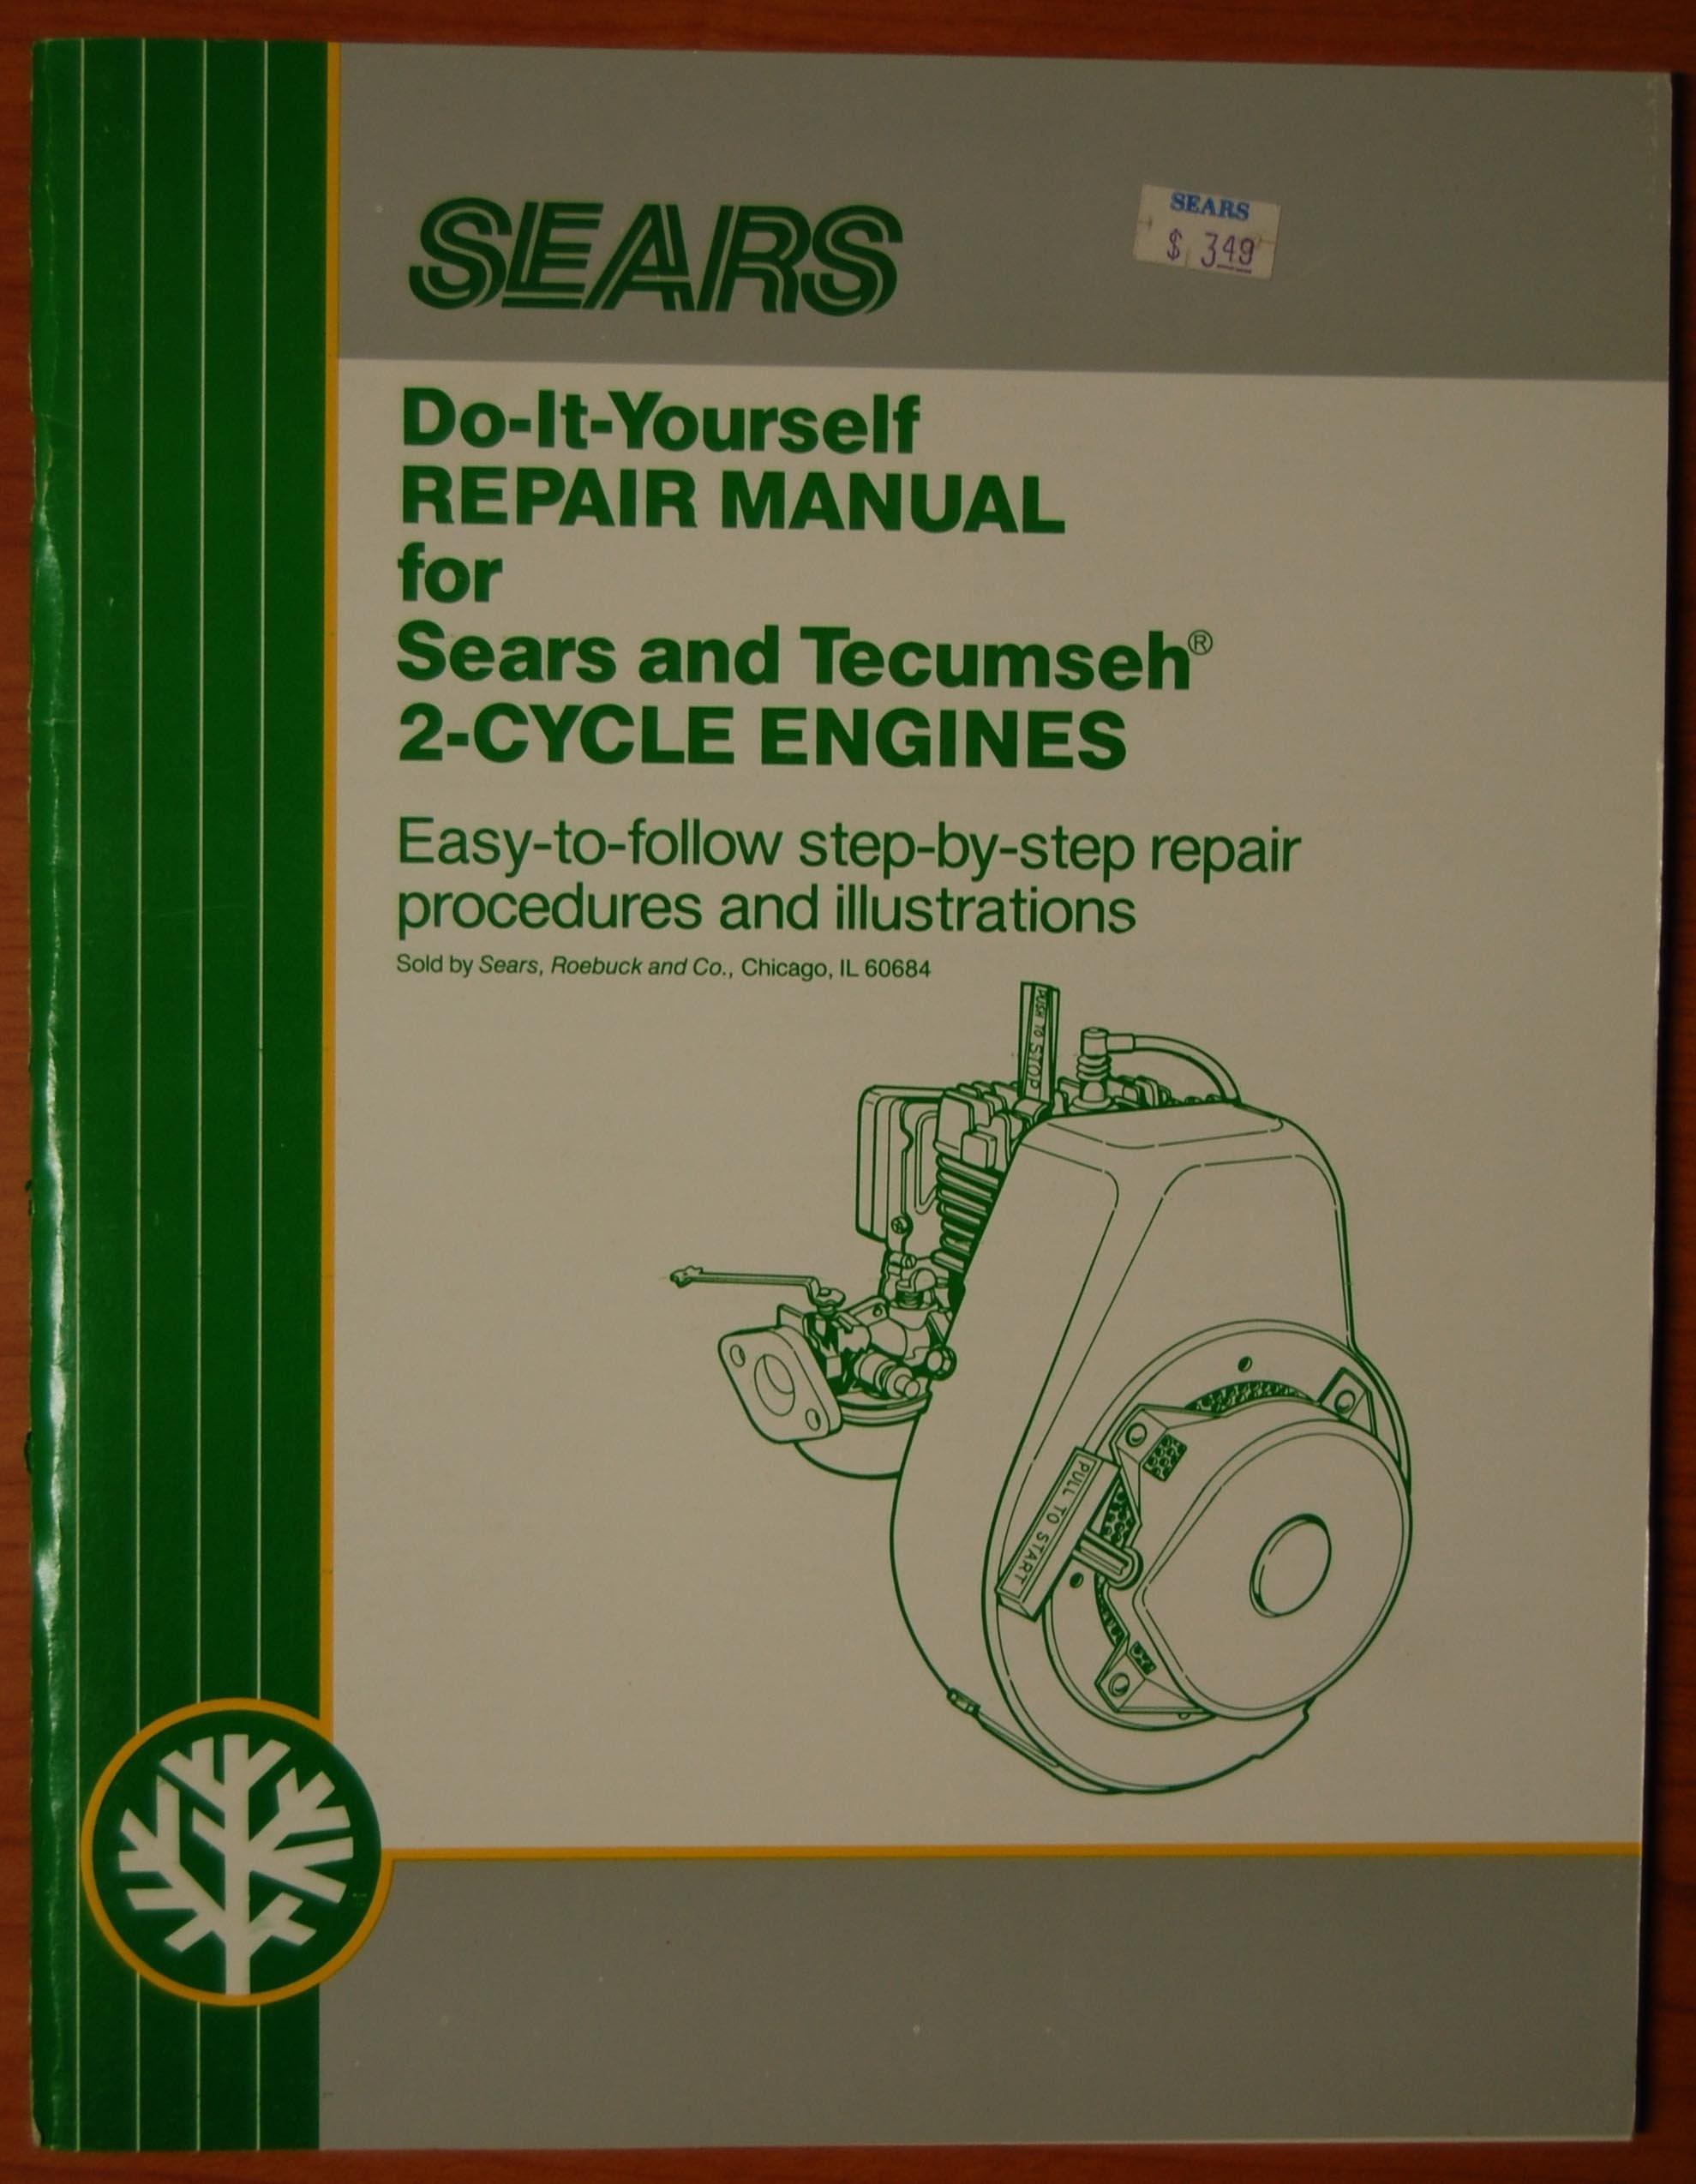 Sears do it yourself repair manual for sears and tecumseh 2 cycle sears do it yourself repair manual for sears and tecumseh 2 cycle engines sears amazon books solutioingenieria Choice Image